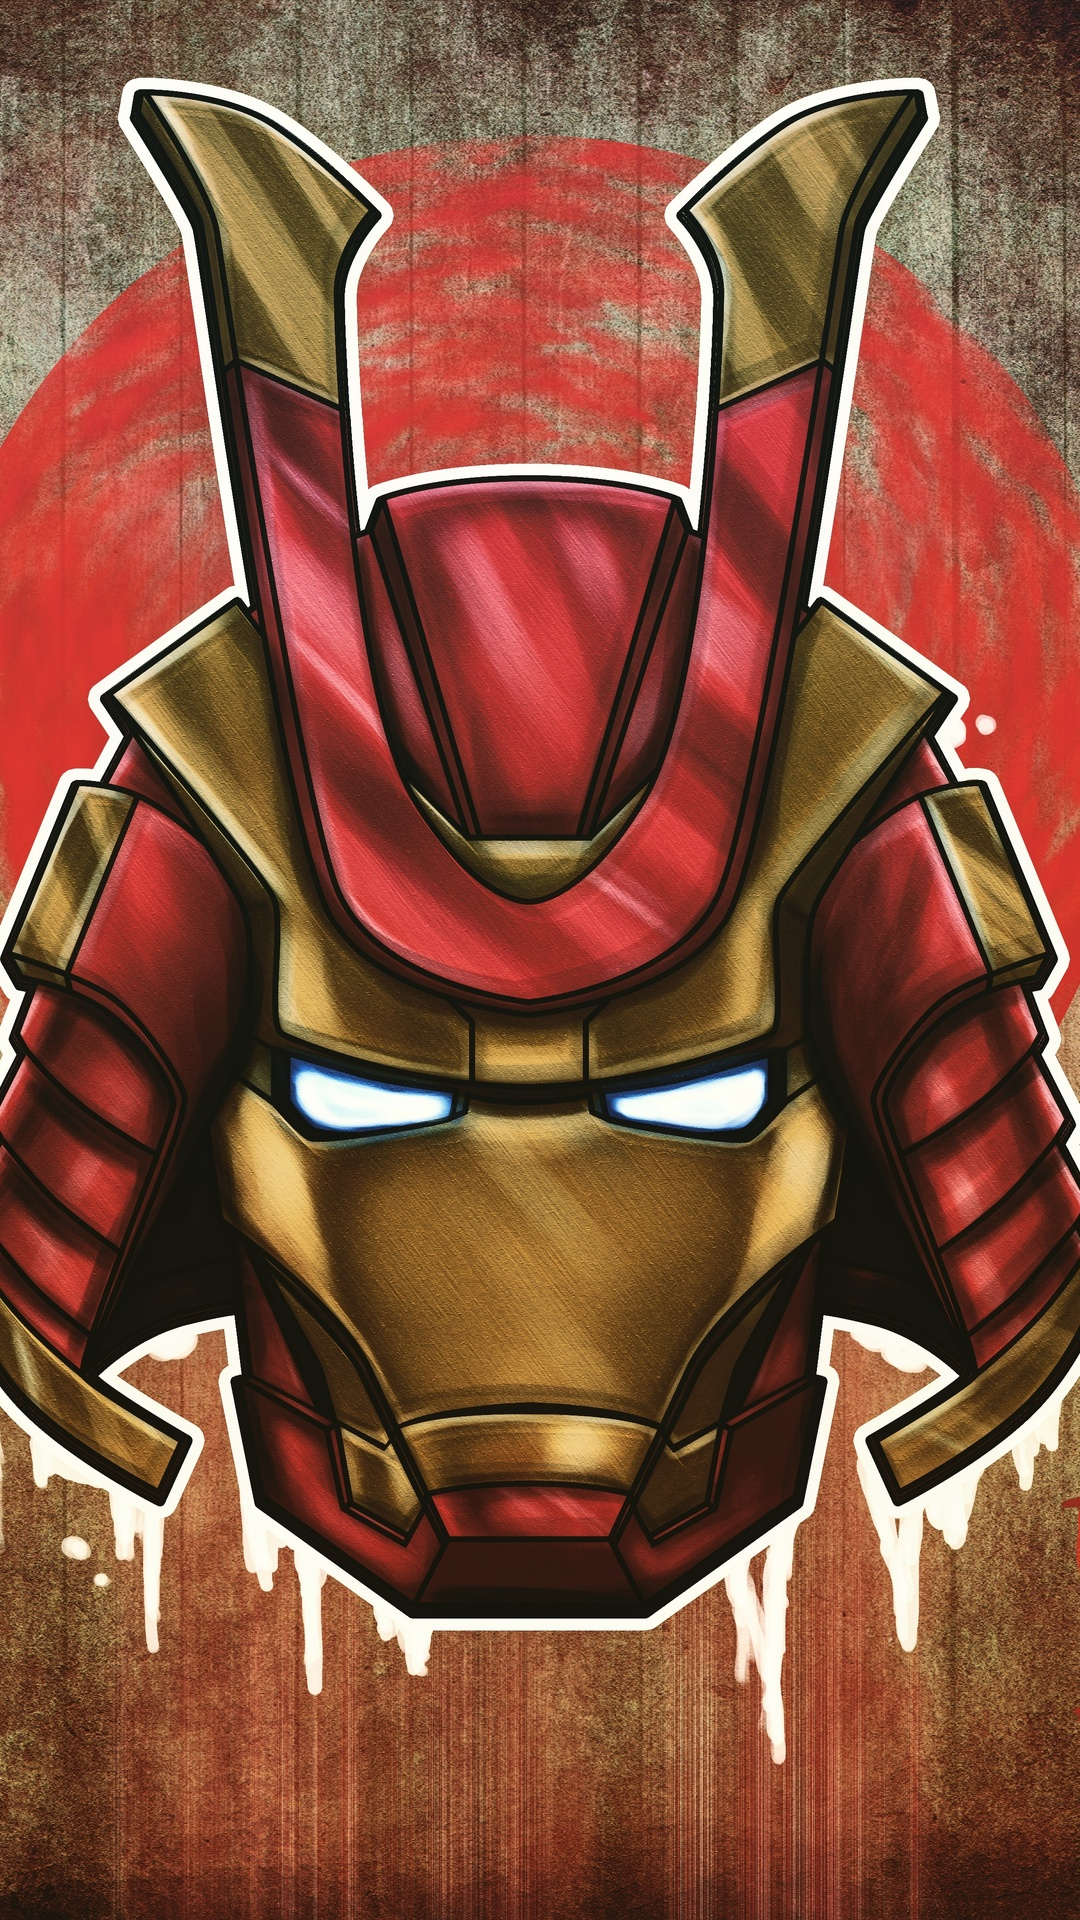 1080x1920 Marvel Samurai Iron Man Iphone 76s6 Plus Pixel Xl One